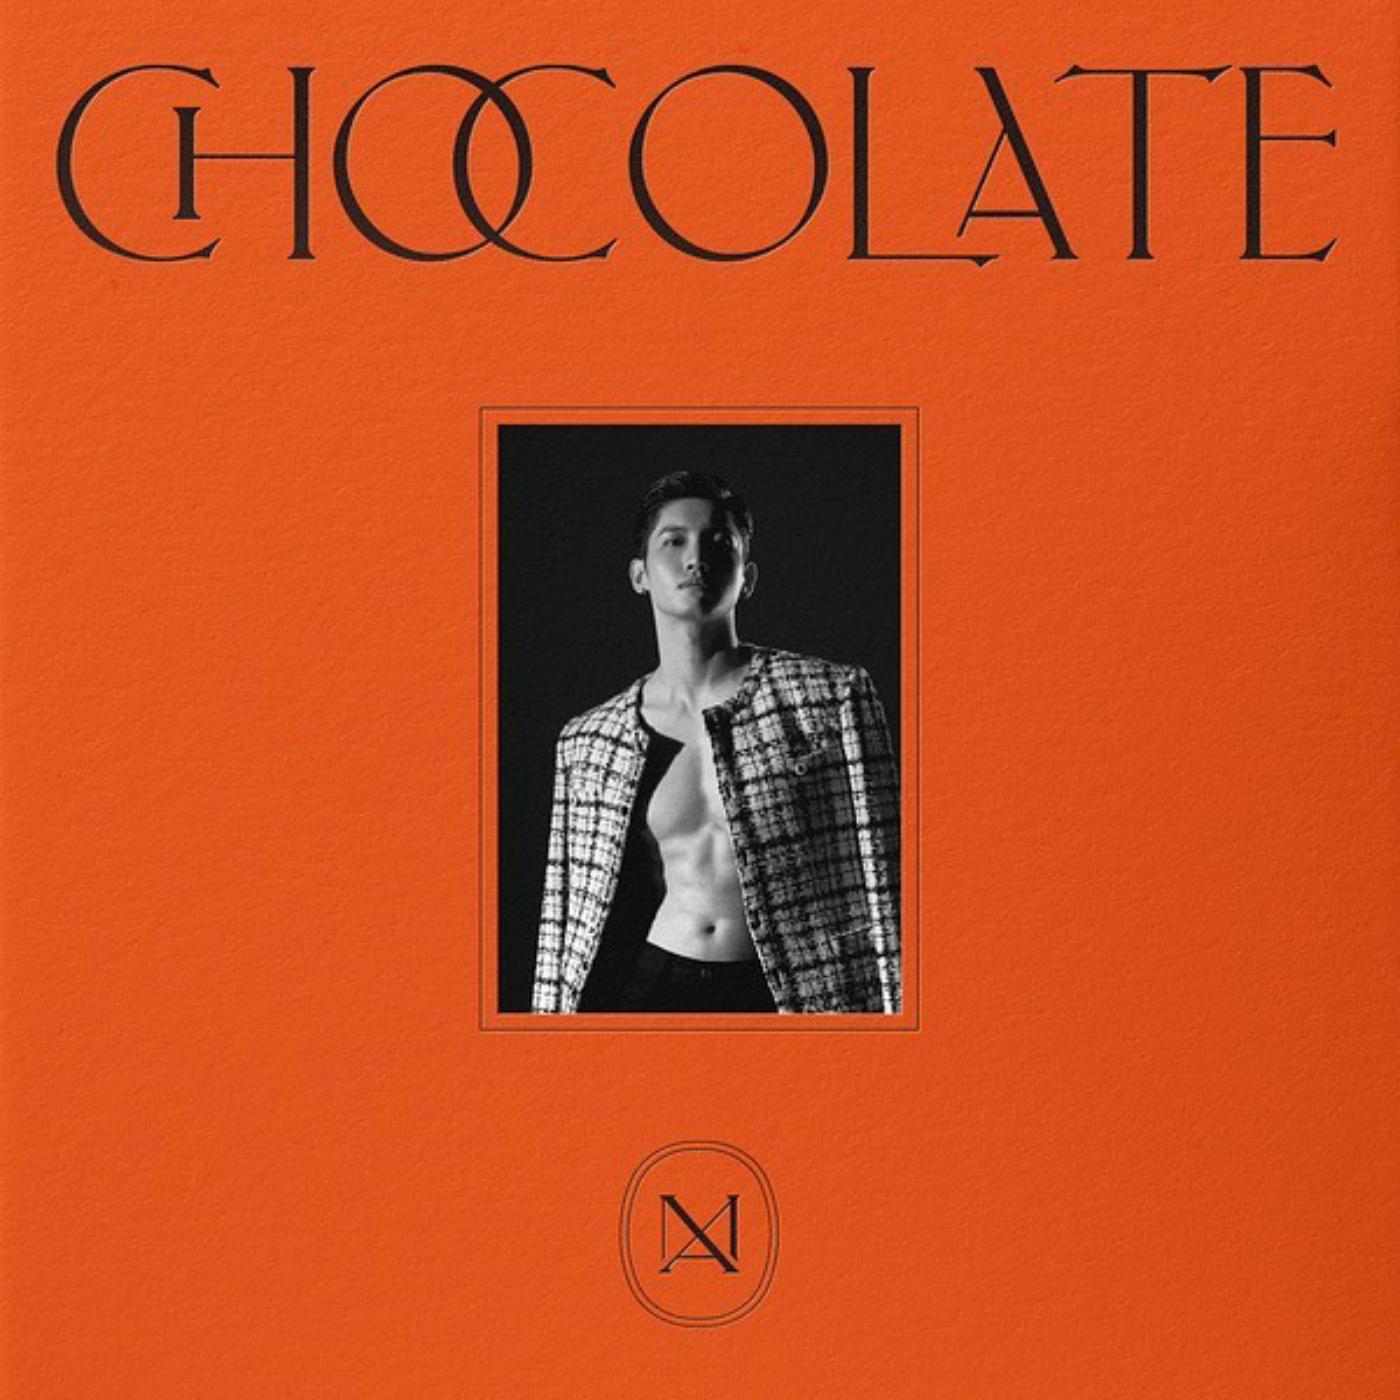 Chocolate (Макс)